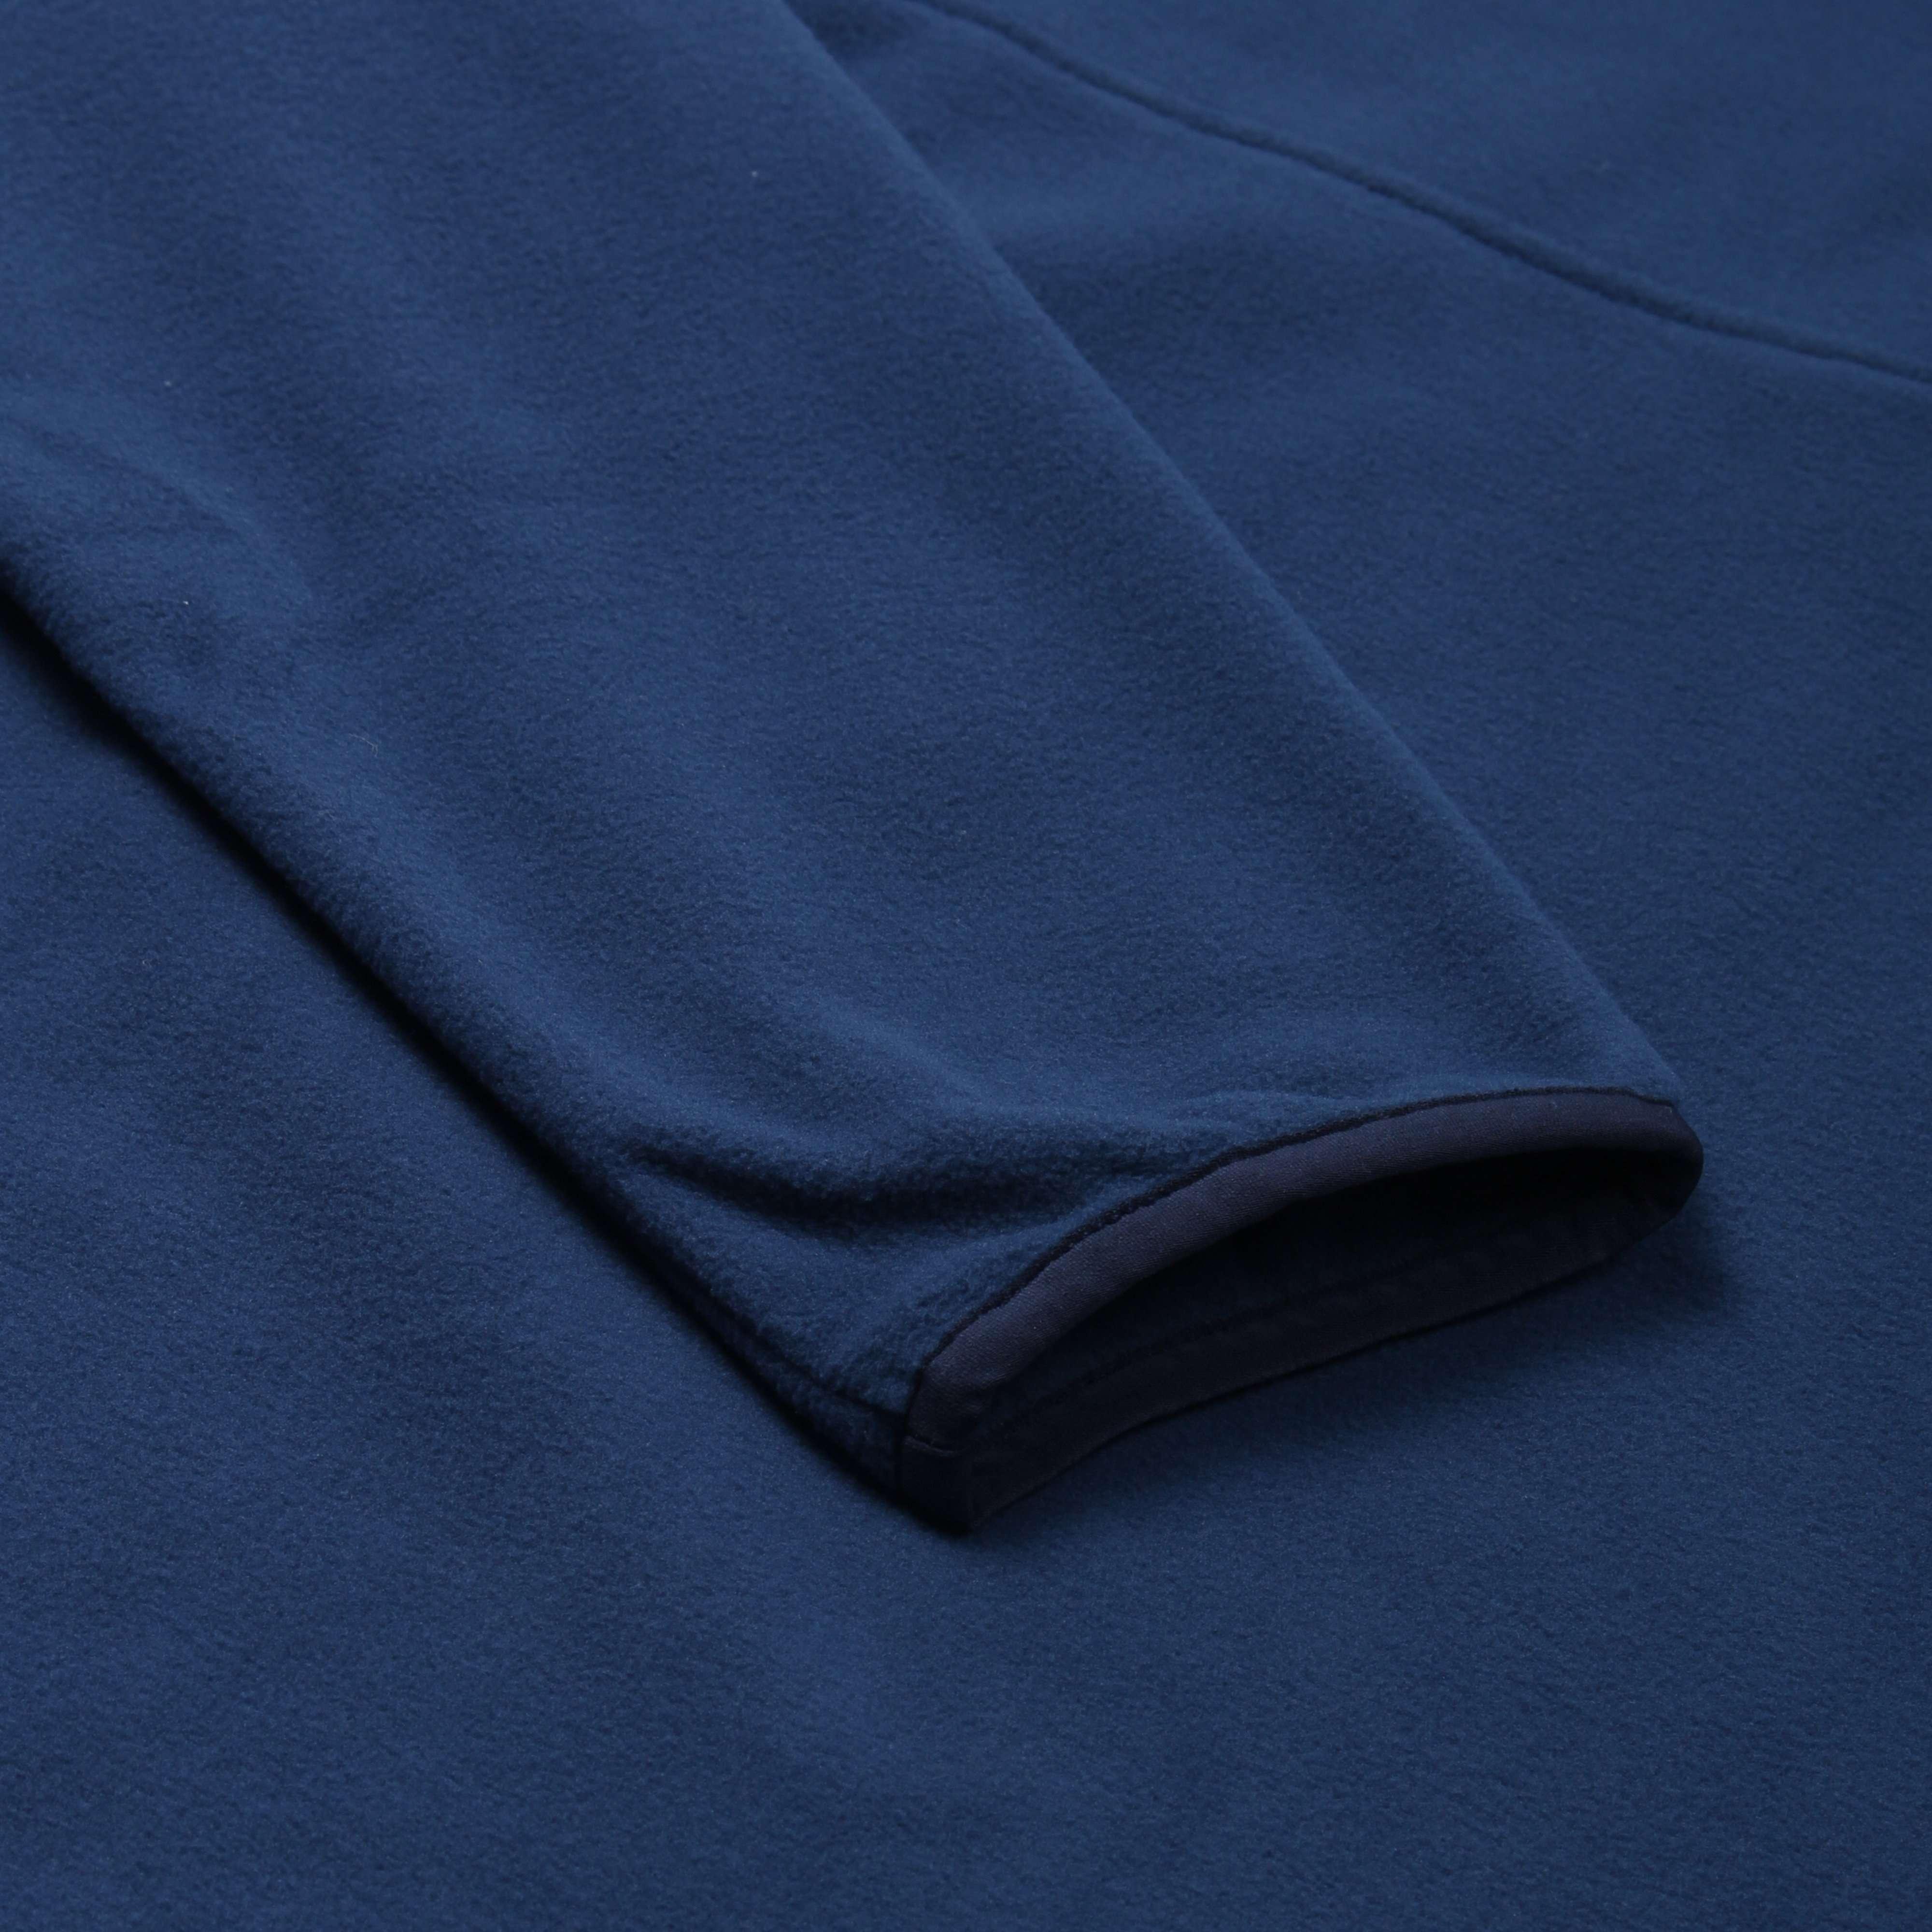 Patagonia Micro D Snap Pullover Jacket